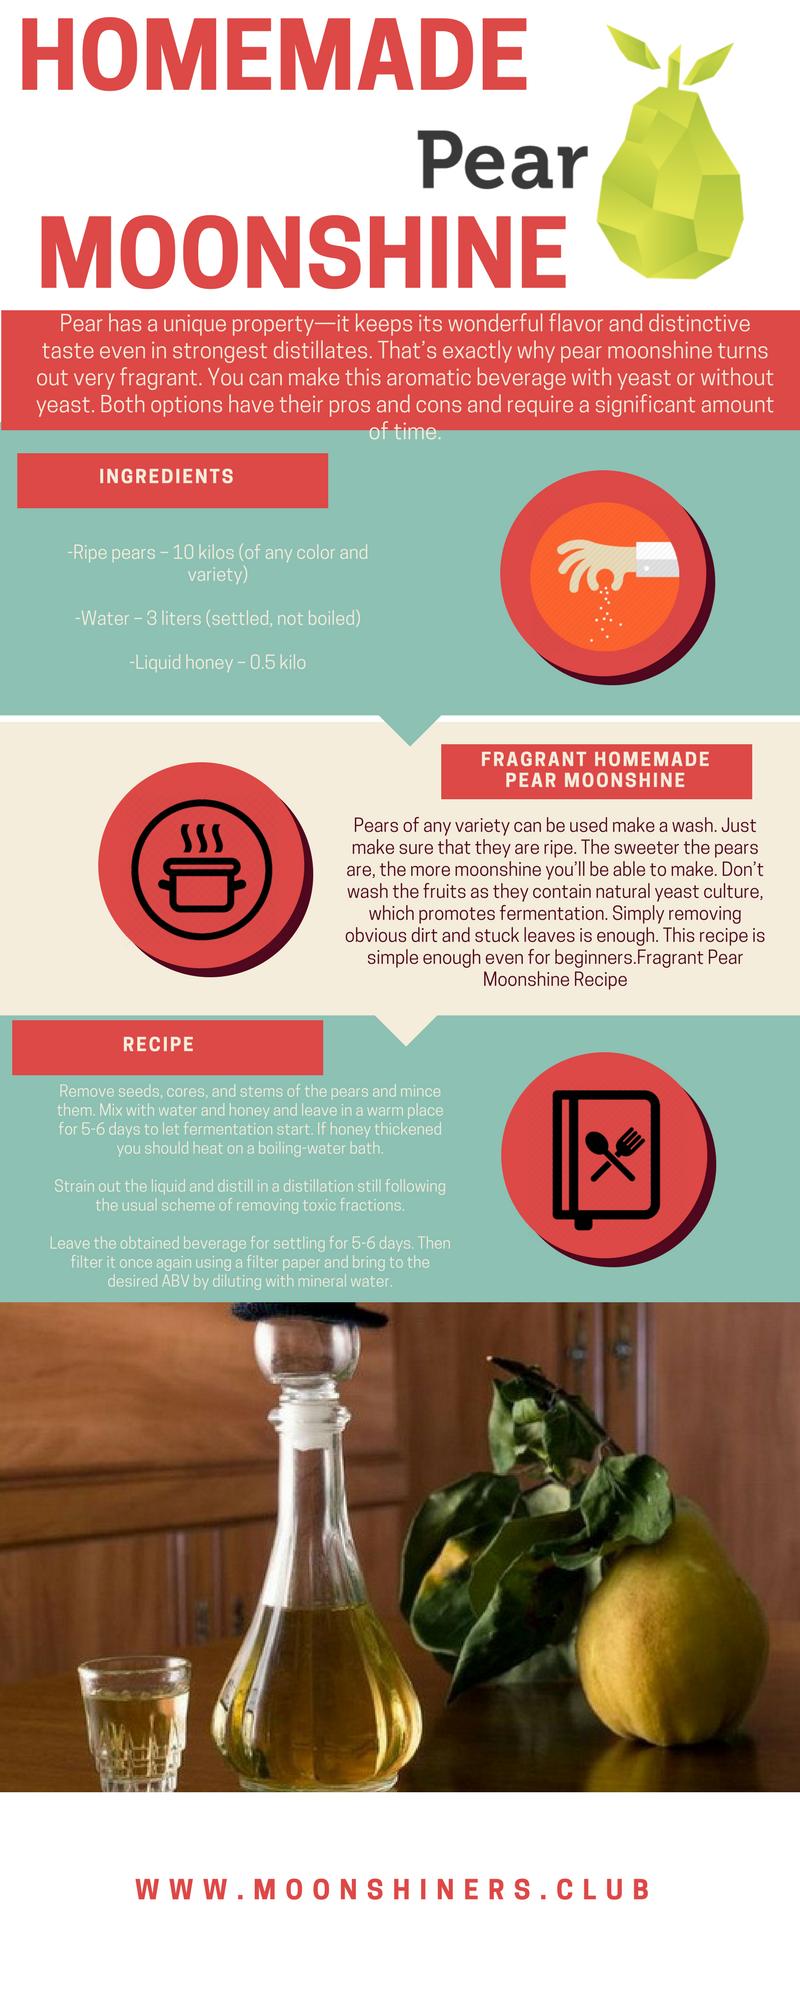 Pear Moonshine Recipe Diy Per Moonshine Easy And Fast Moonshine Recipes Moonshine Recipes Homemade Moonshine Mash Recipe